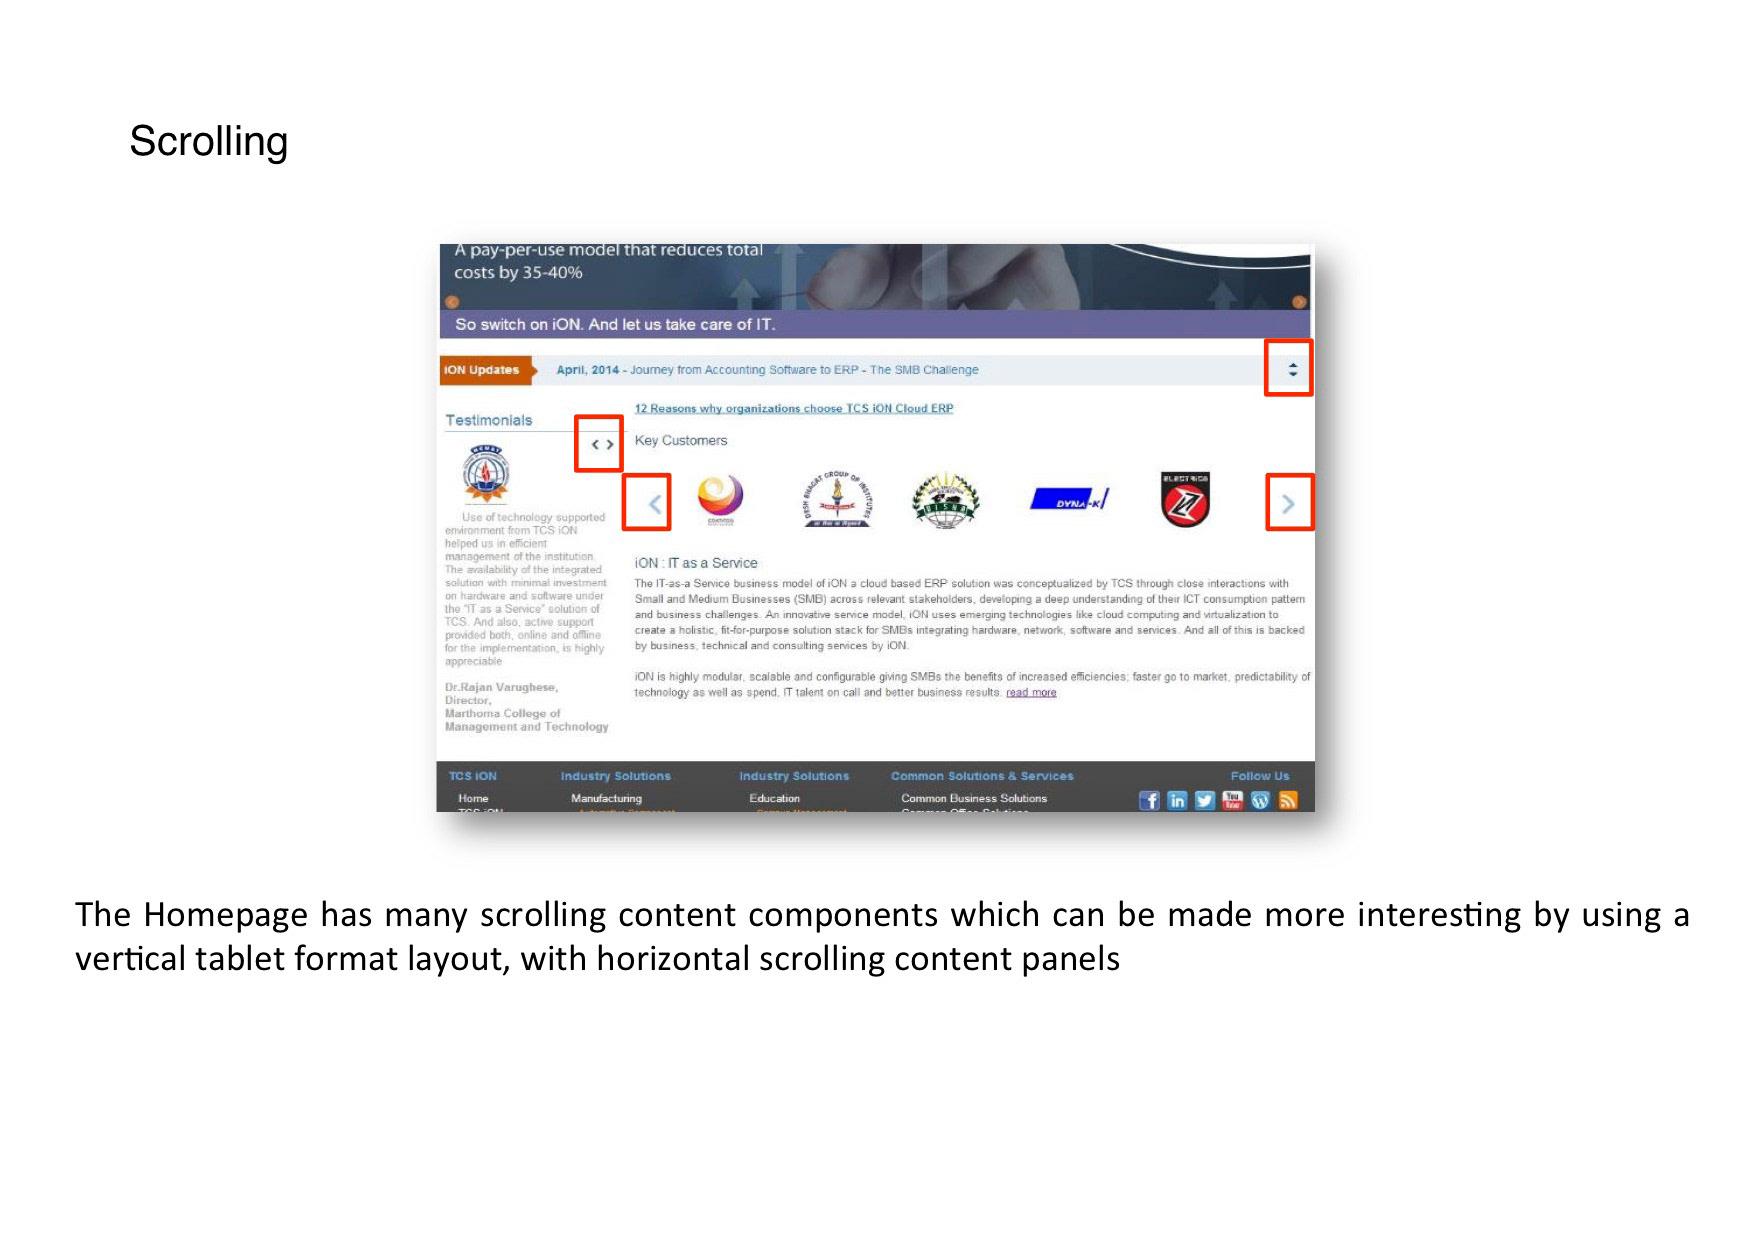 ankita deshpande - Responsive Web Design